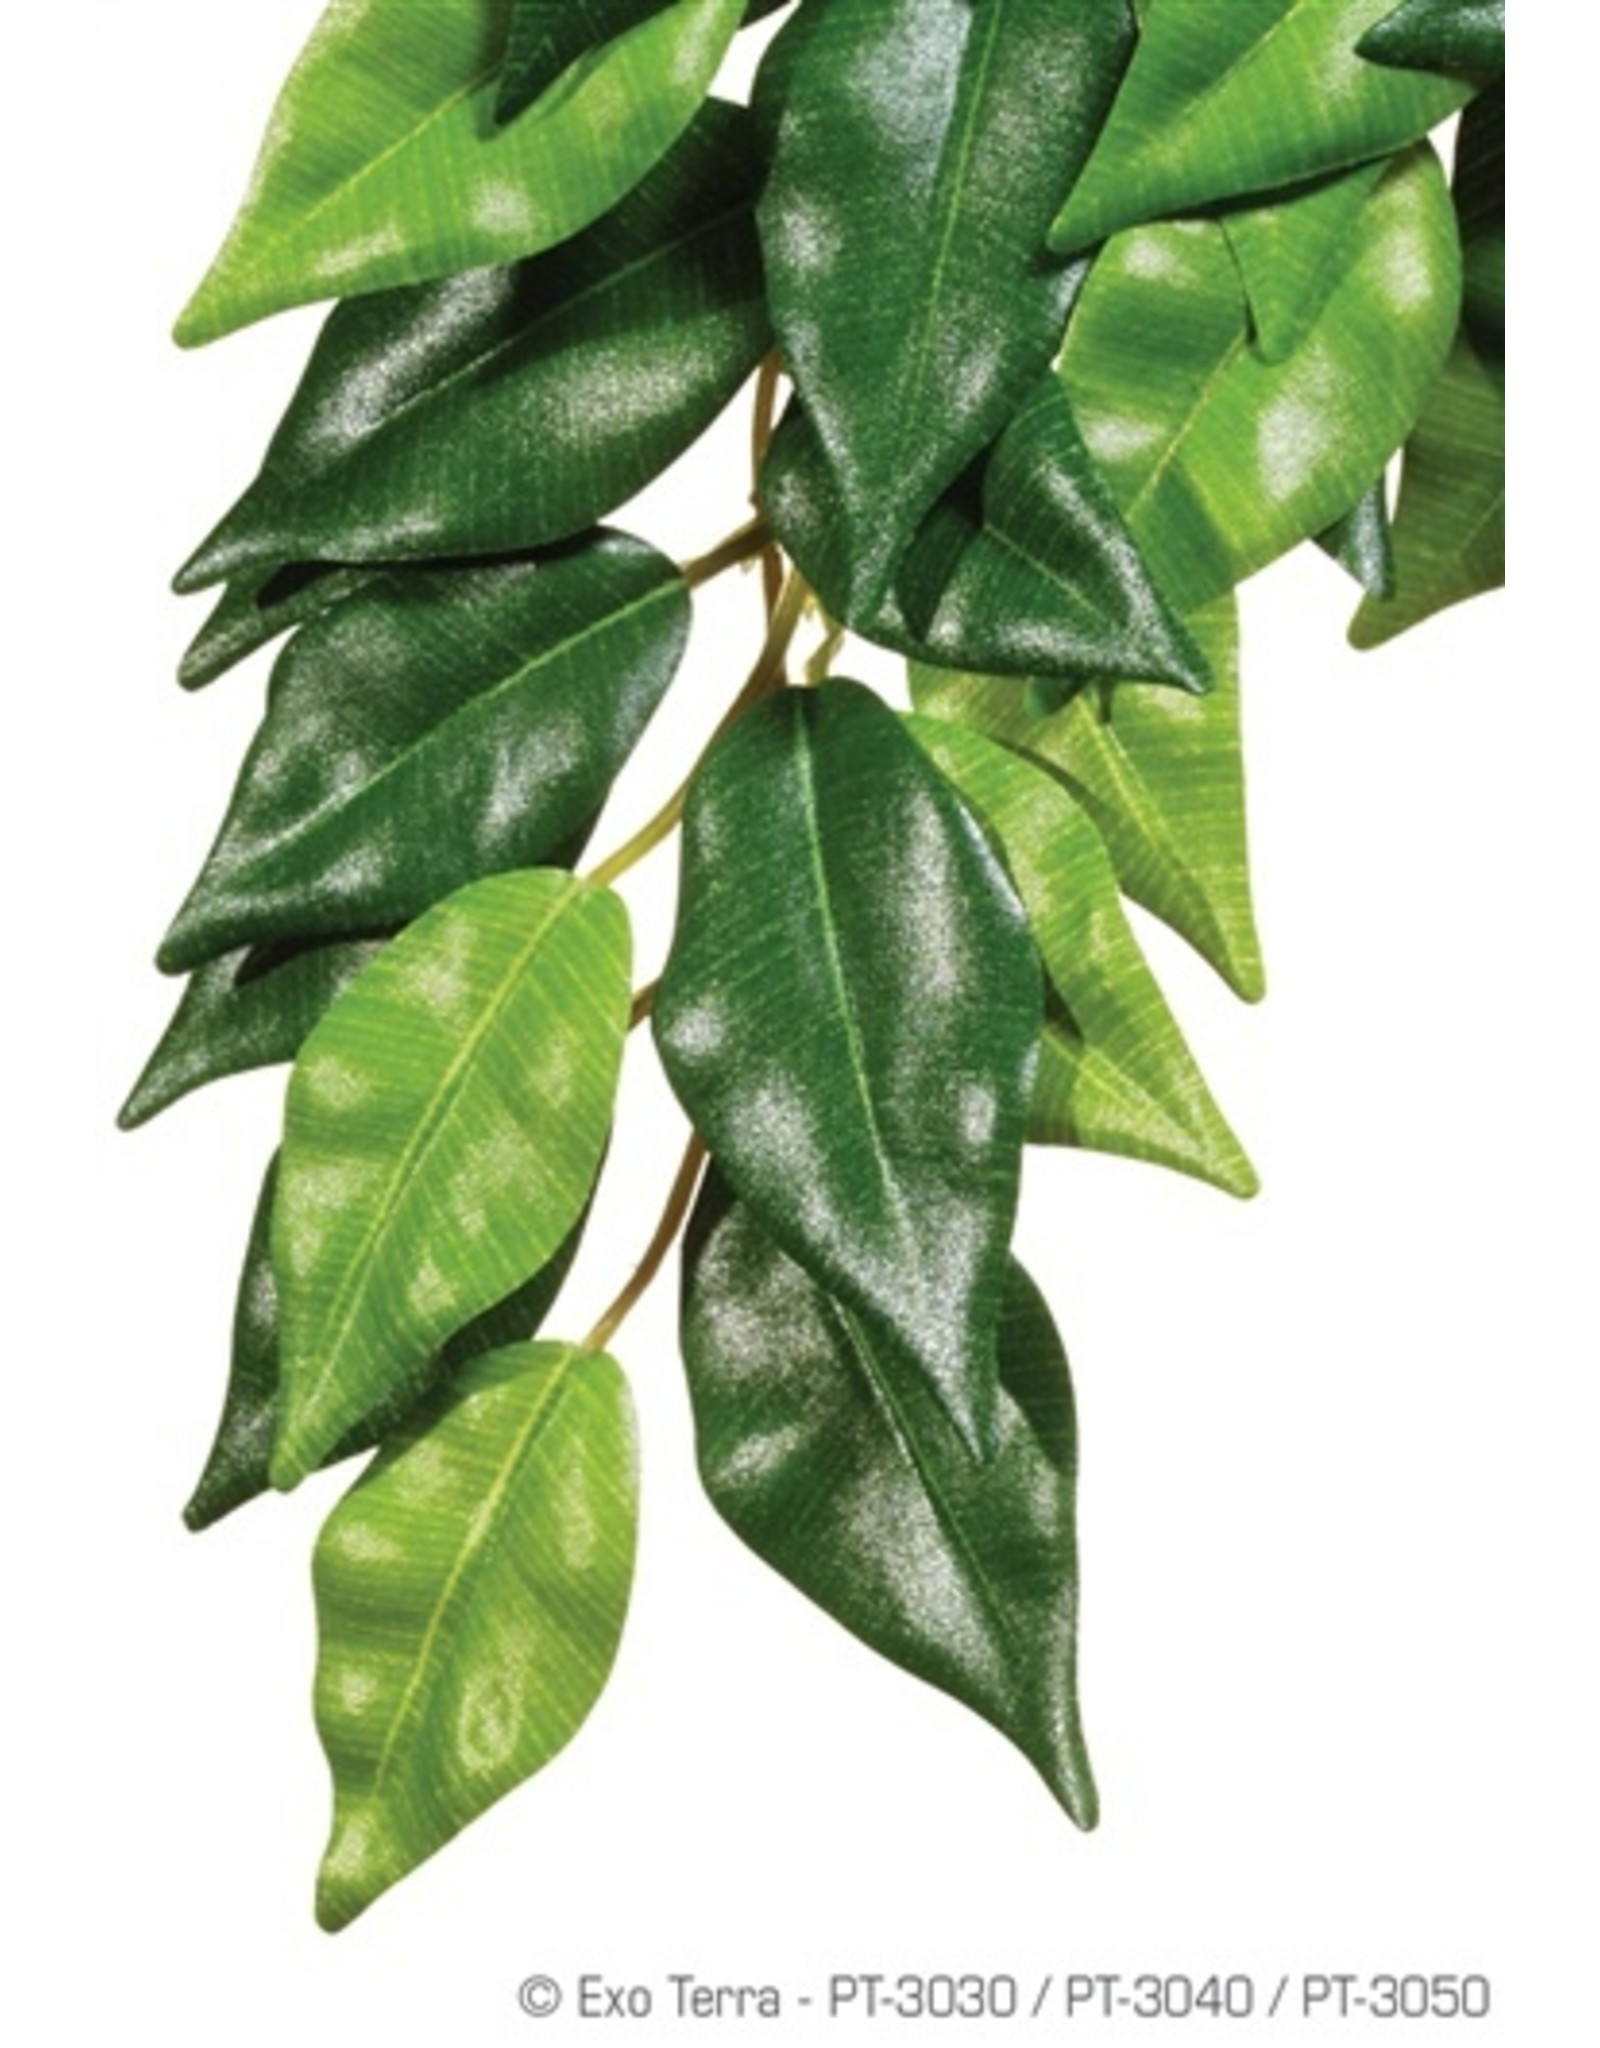 Exo Terra EXO TERRA Silk Hanging Rainforest Plant